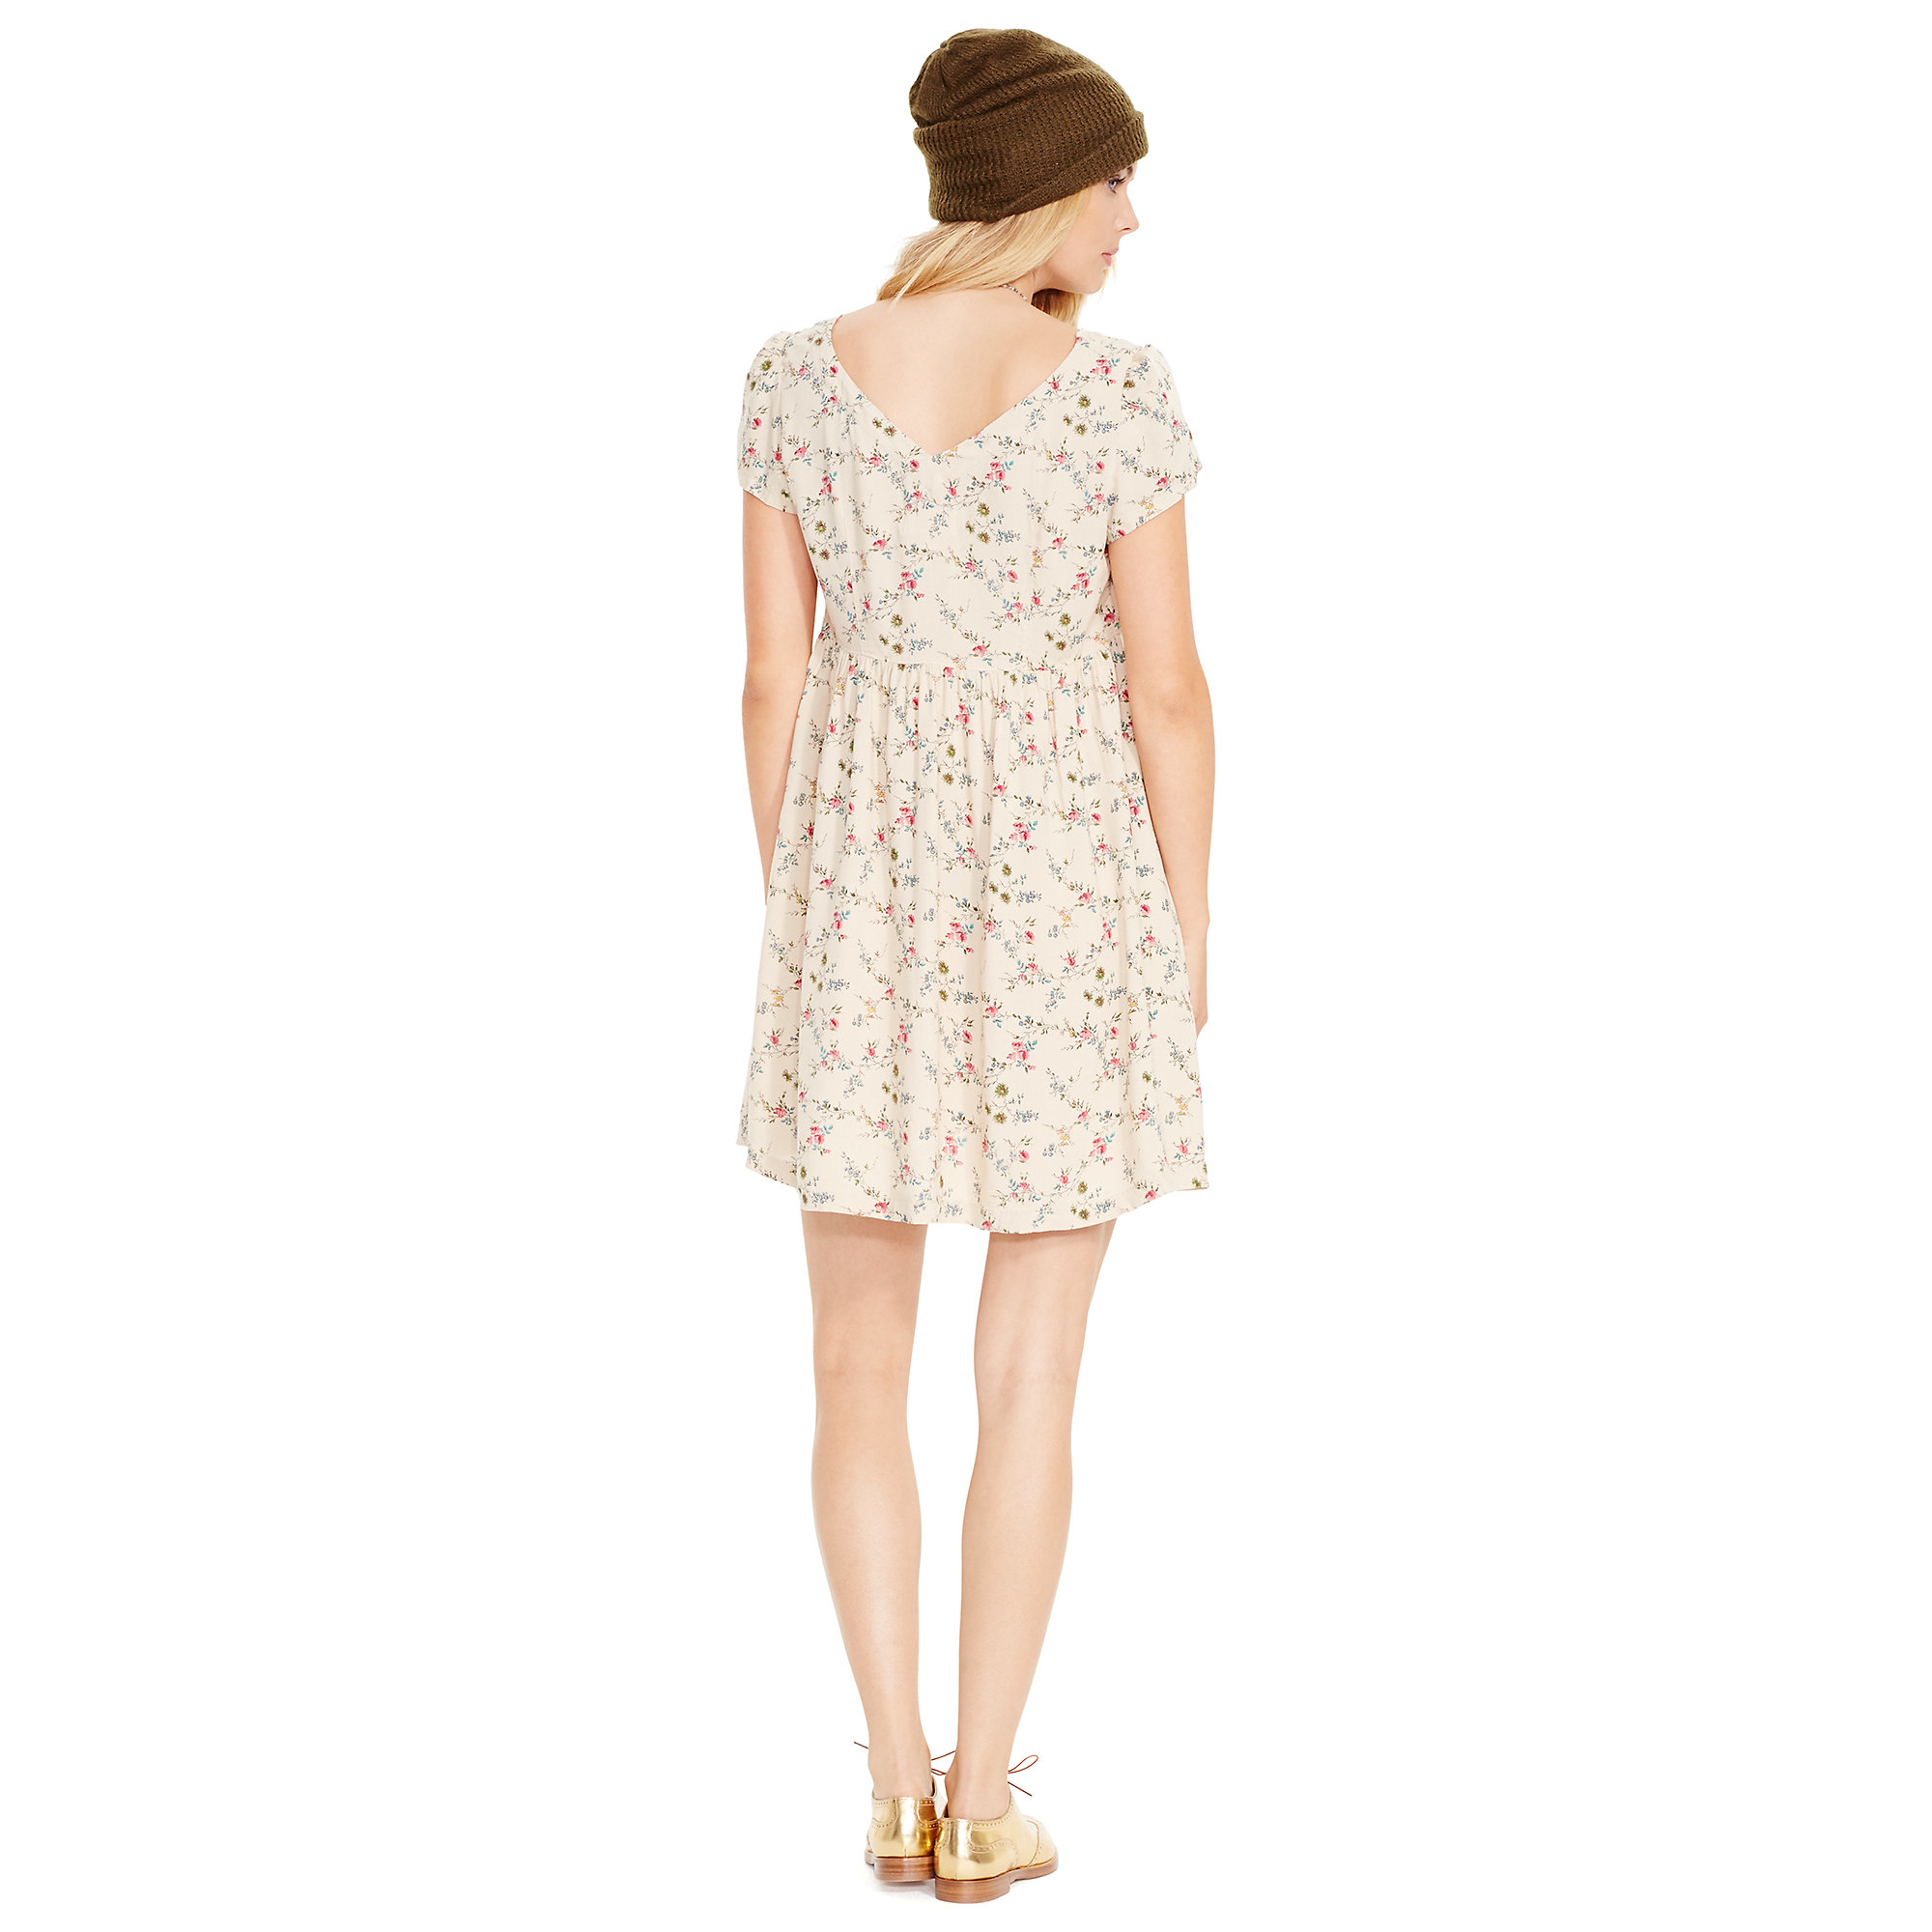 ac1812f5 Denim & Supply Ralph Lauren Floral Button-front Dress - Lyst